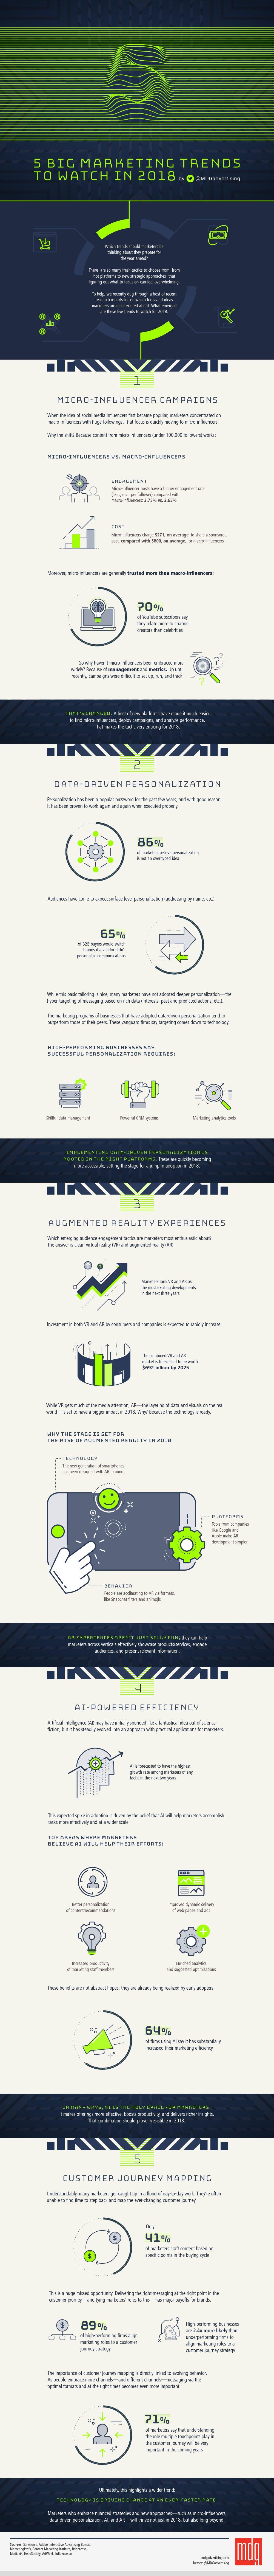 Vijf grote marketing trends 2018